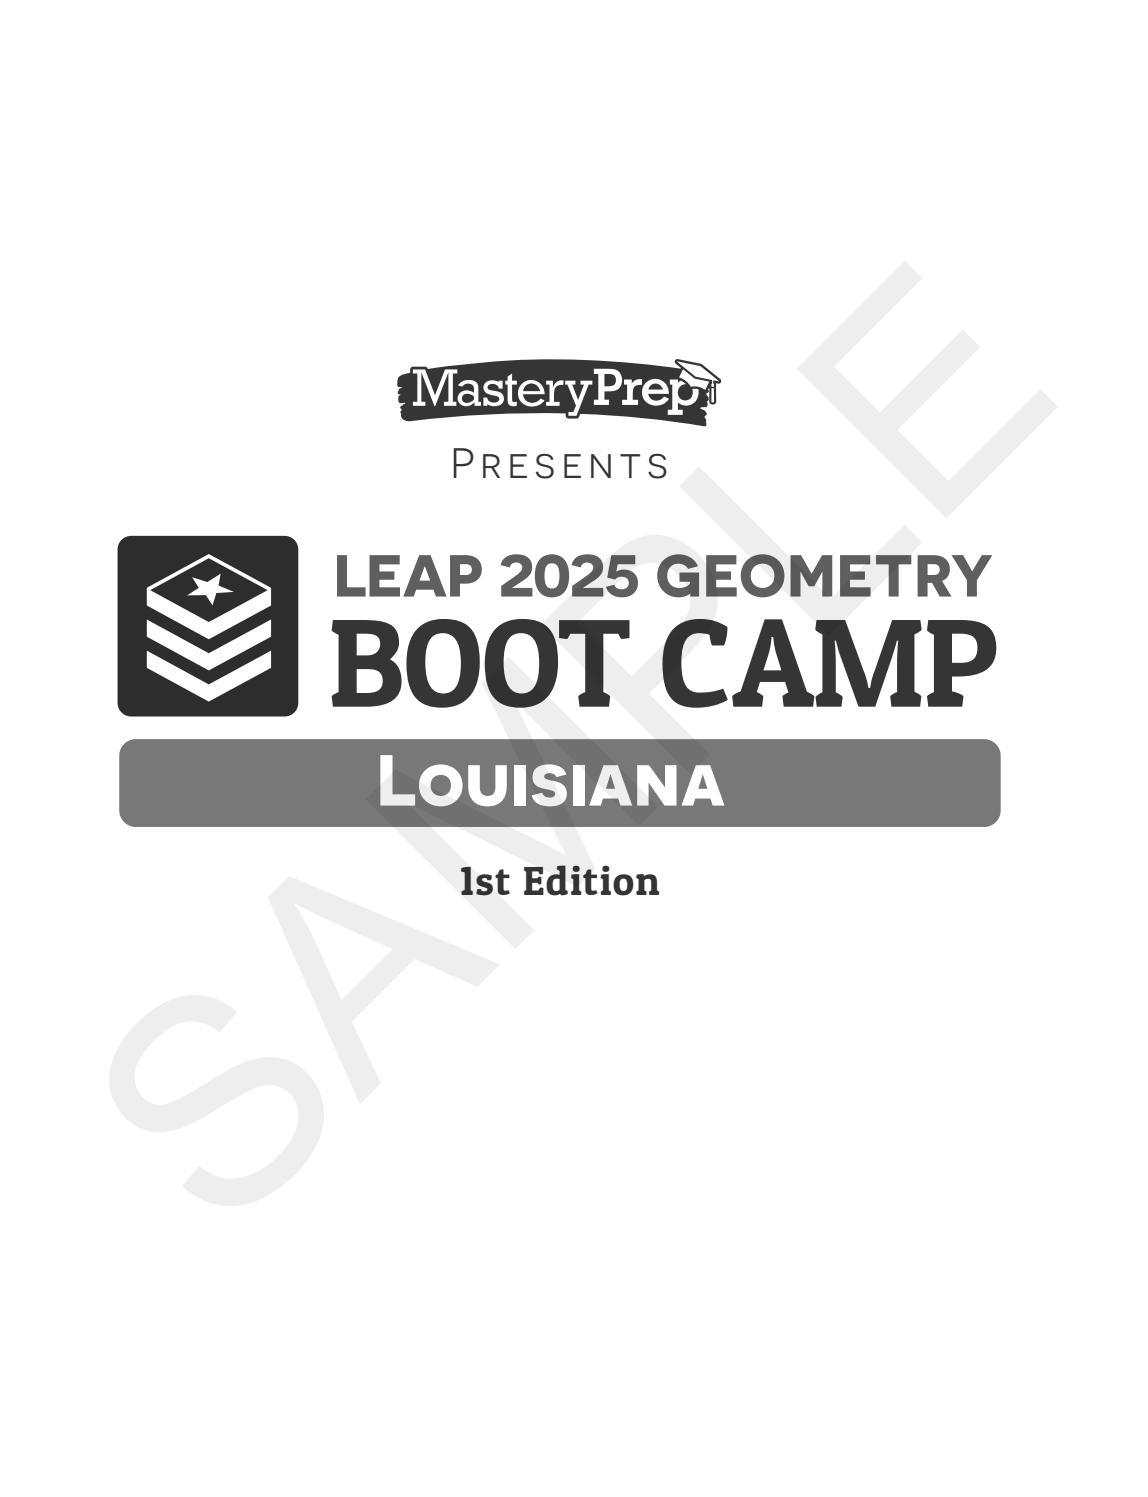 Sample LEAP 2025 Geometry Boot Camp